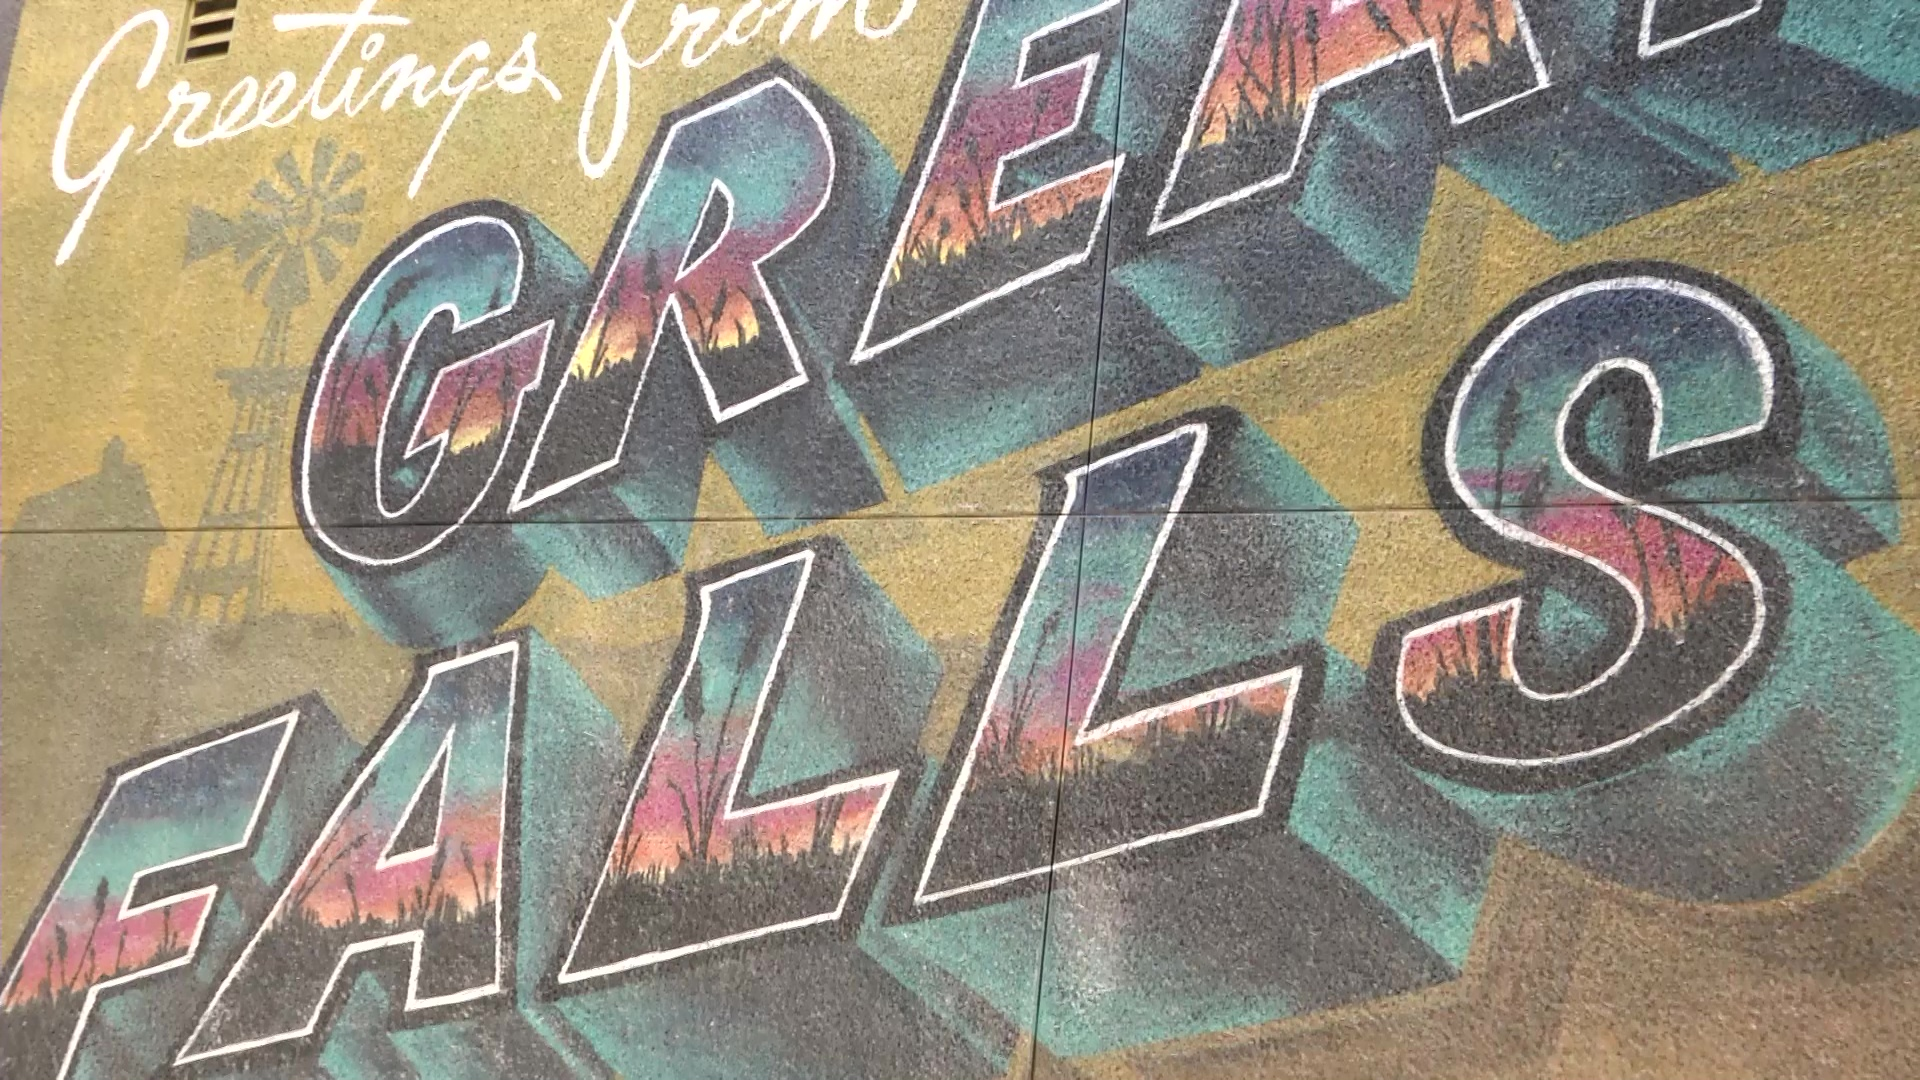 Muralist returns to Great Falls for ArtsFest MONTANA